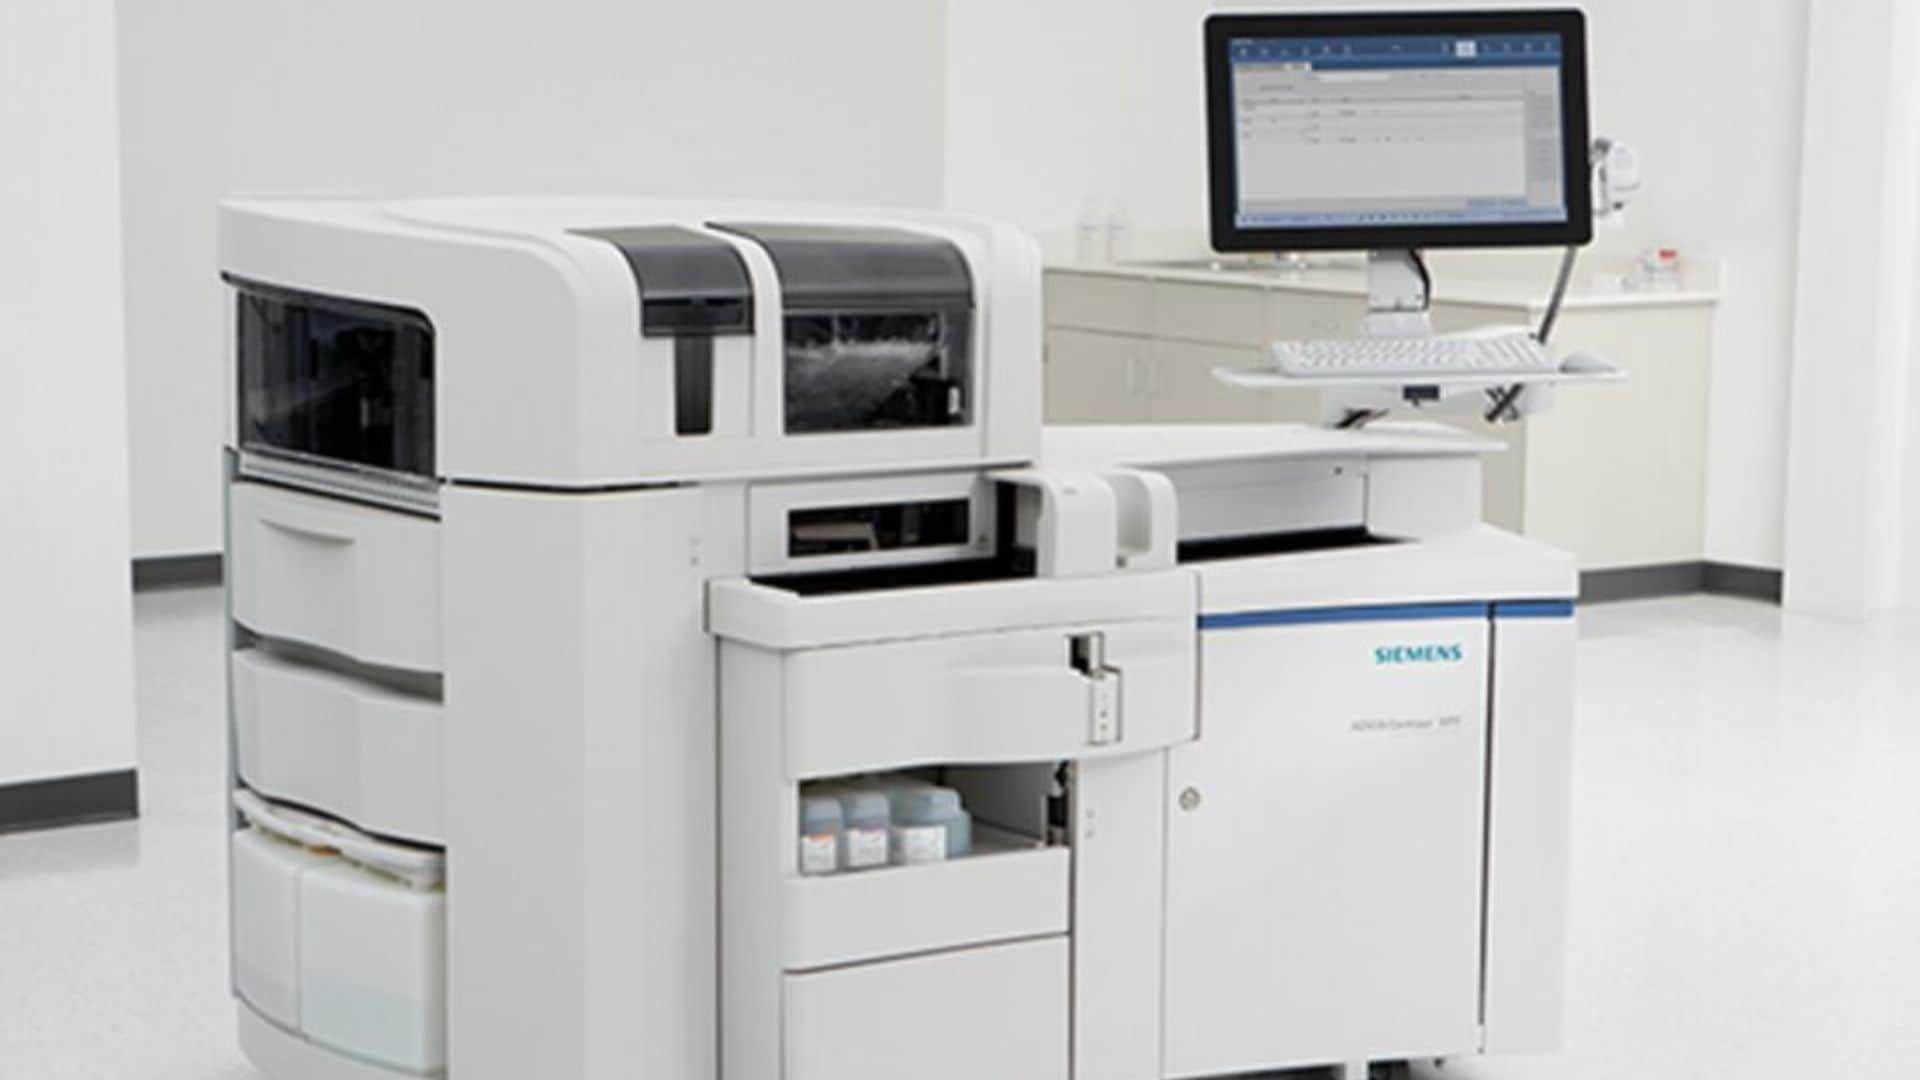 SIEMENS Advia Centaur XPT Immunlogy Analyzer